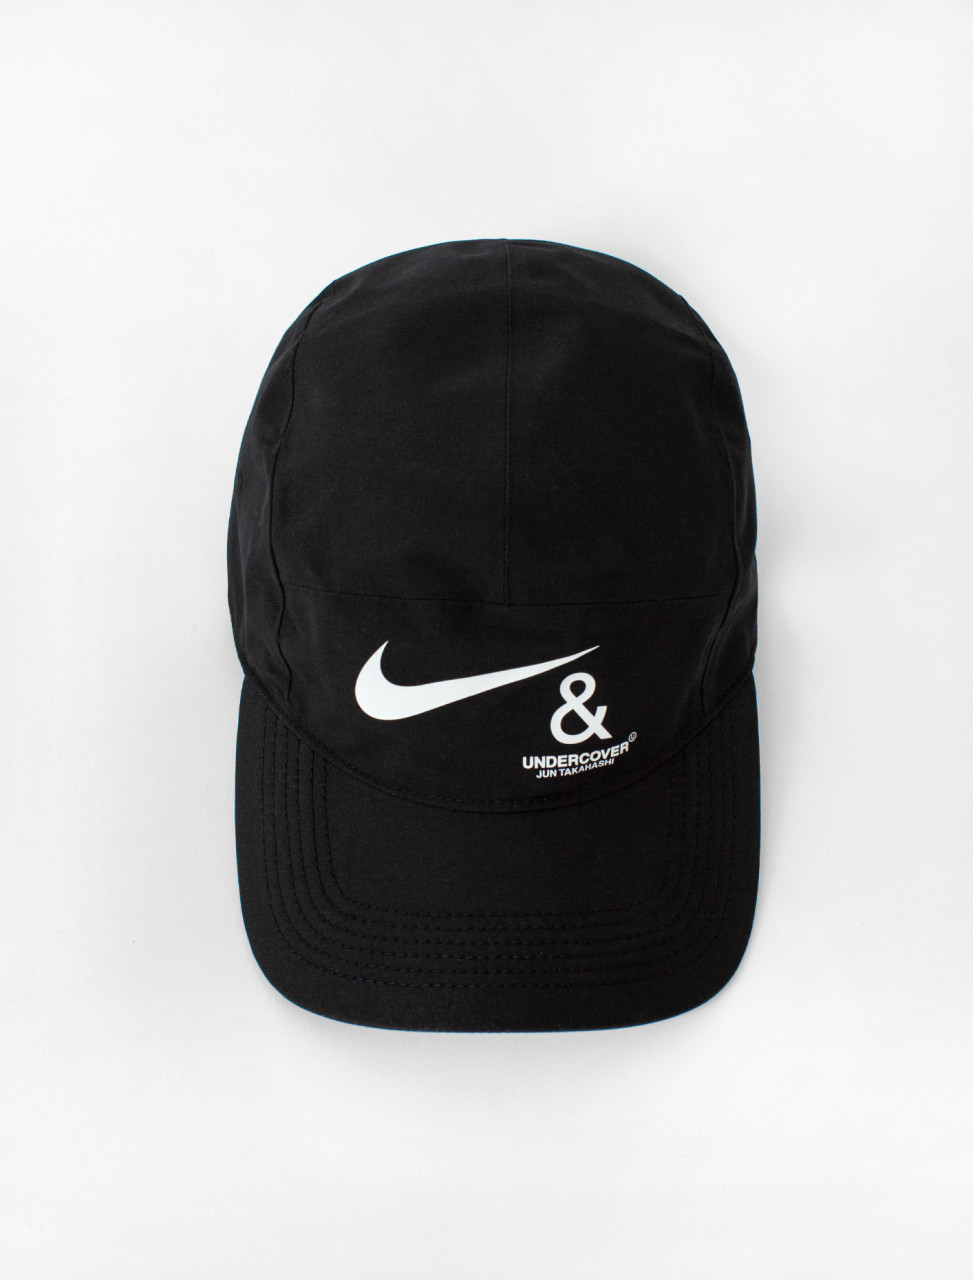 x Undercover AW84 Cap in Black